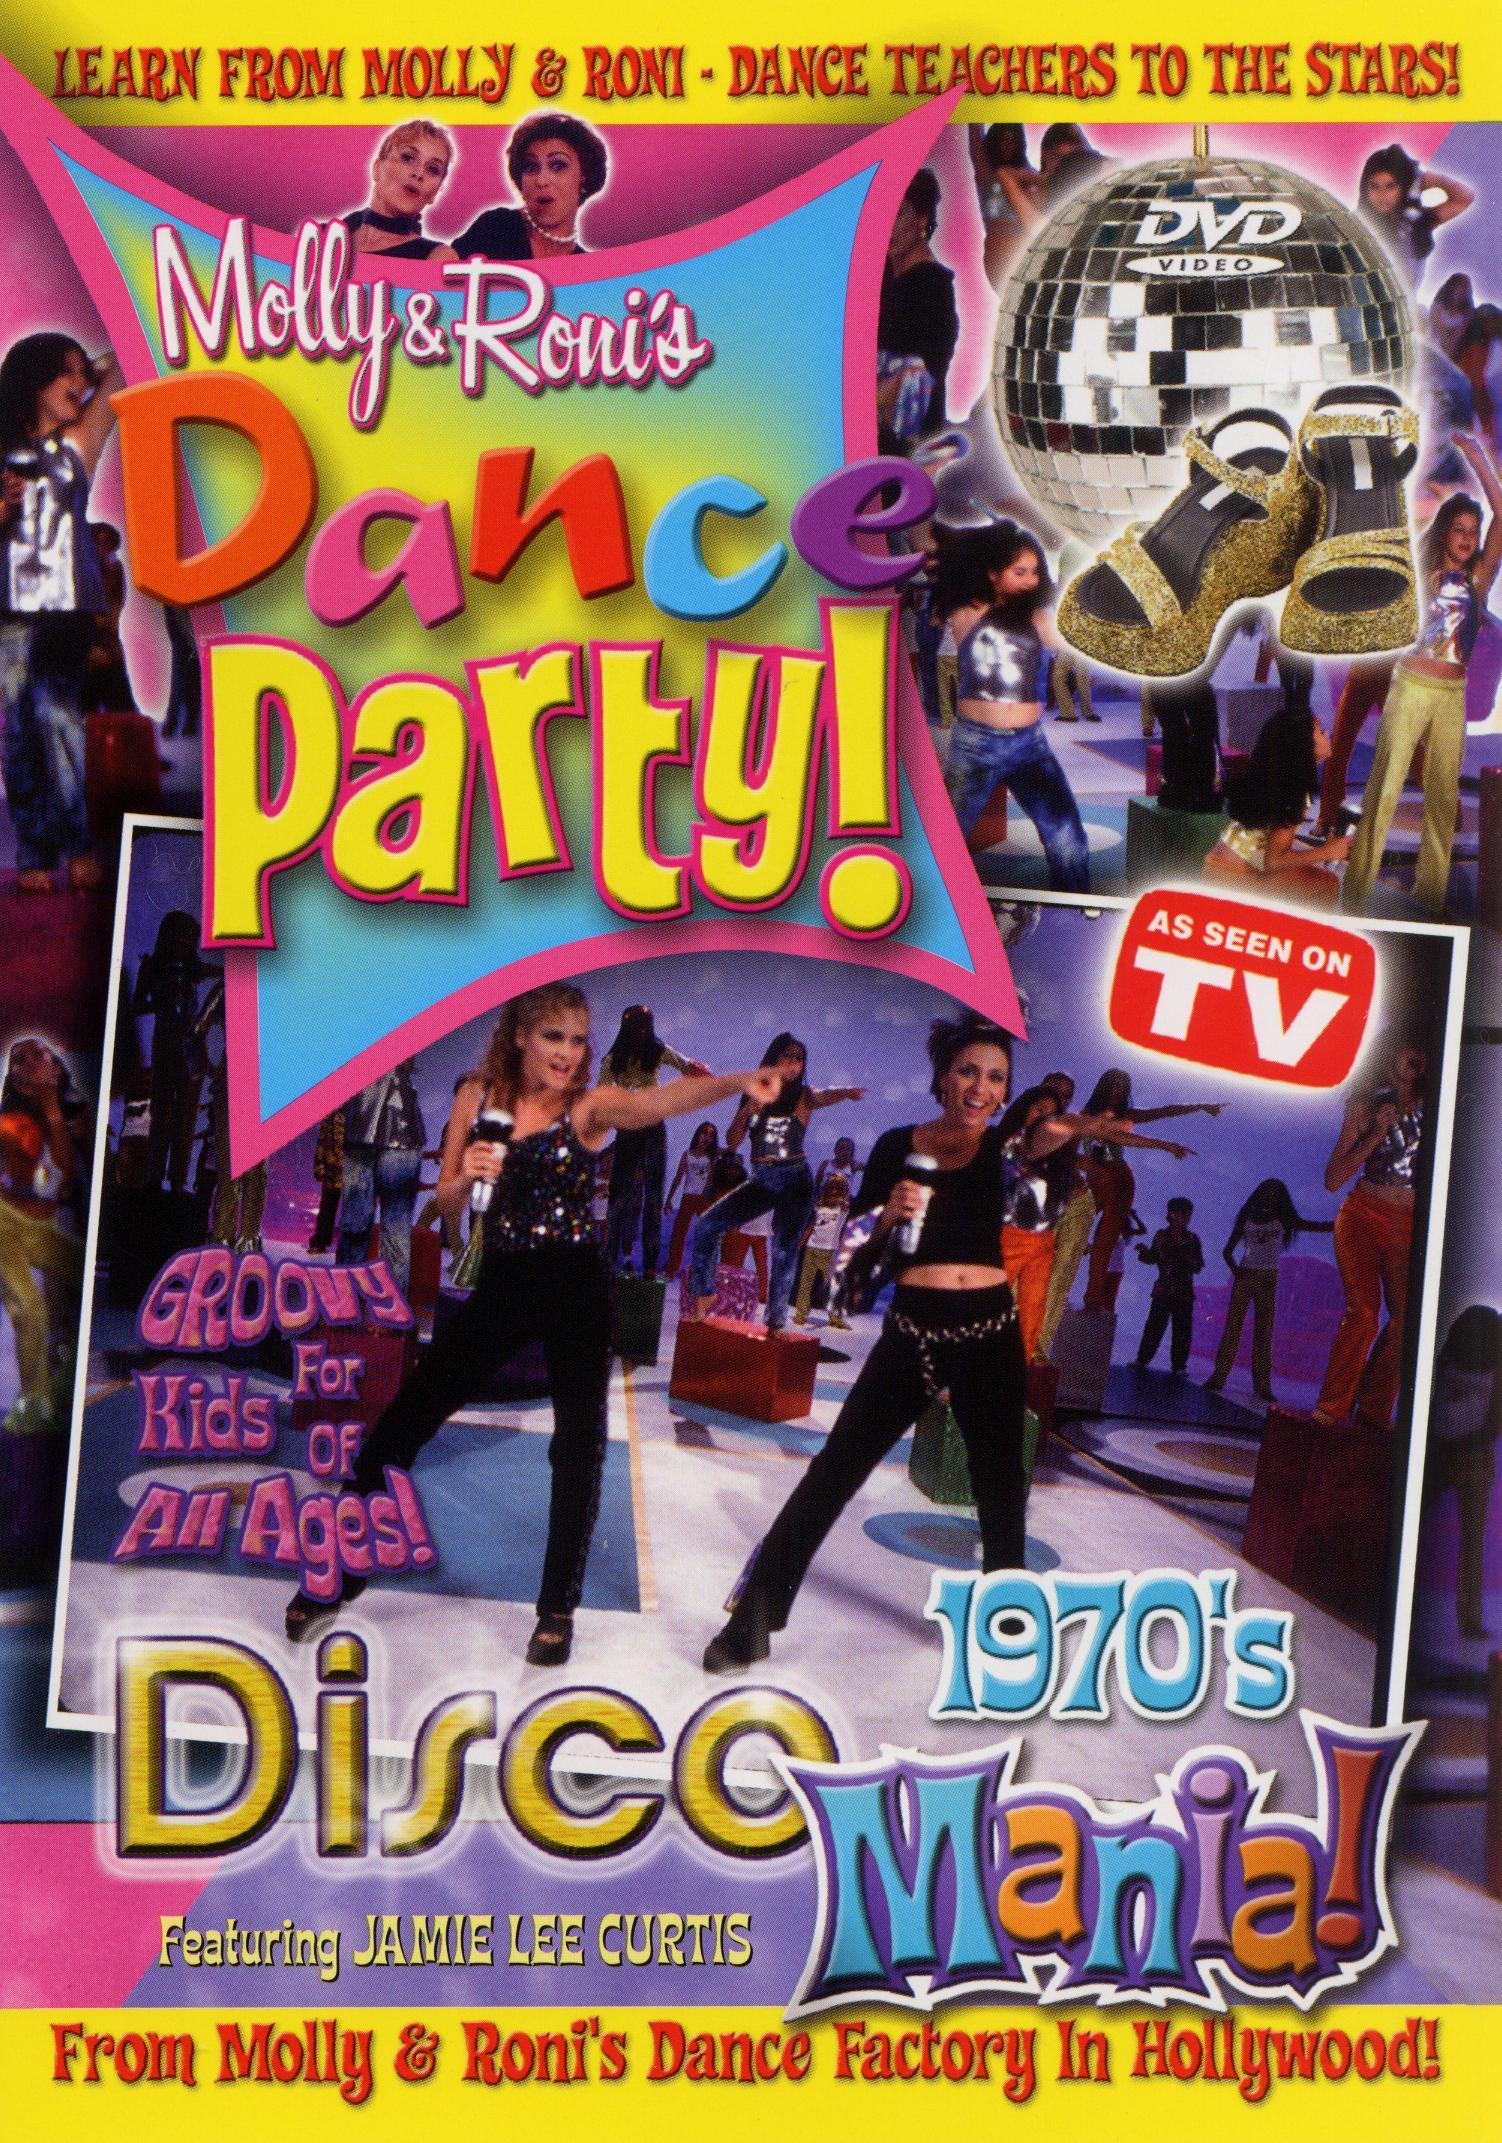 Molly & Roni's Dance Party, Vol. 1: 1970s Disco Mania